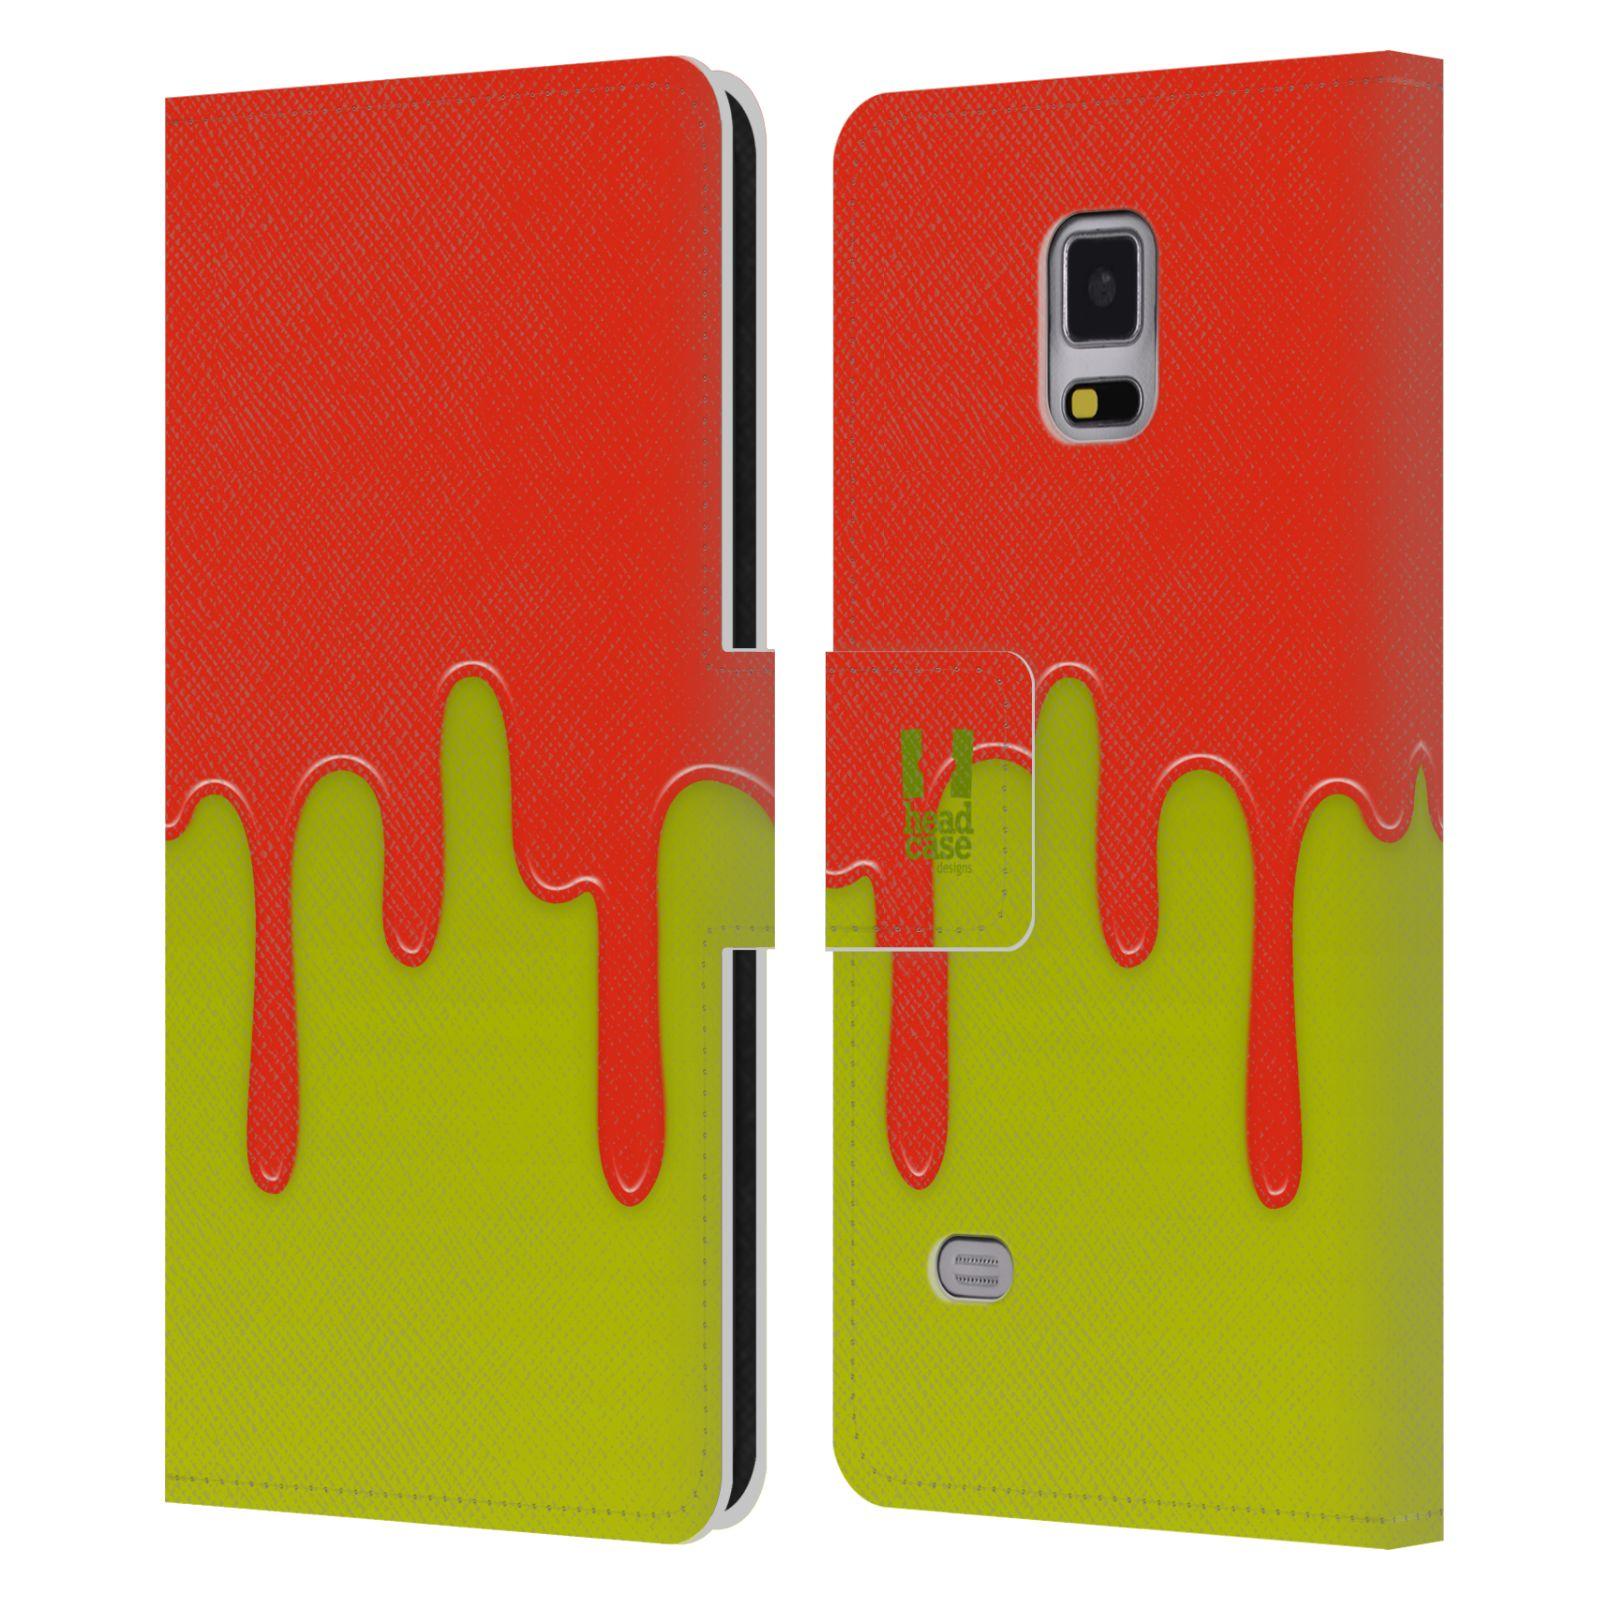 HEAD CASE Flipové pouzdro pro mobil Samsung Galaxy Note 4 Rozlitá barva oranžová a zelená